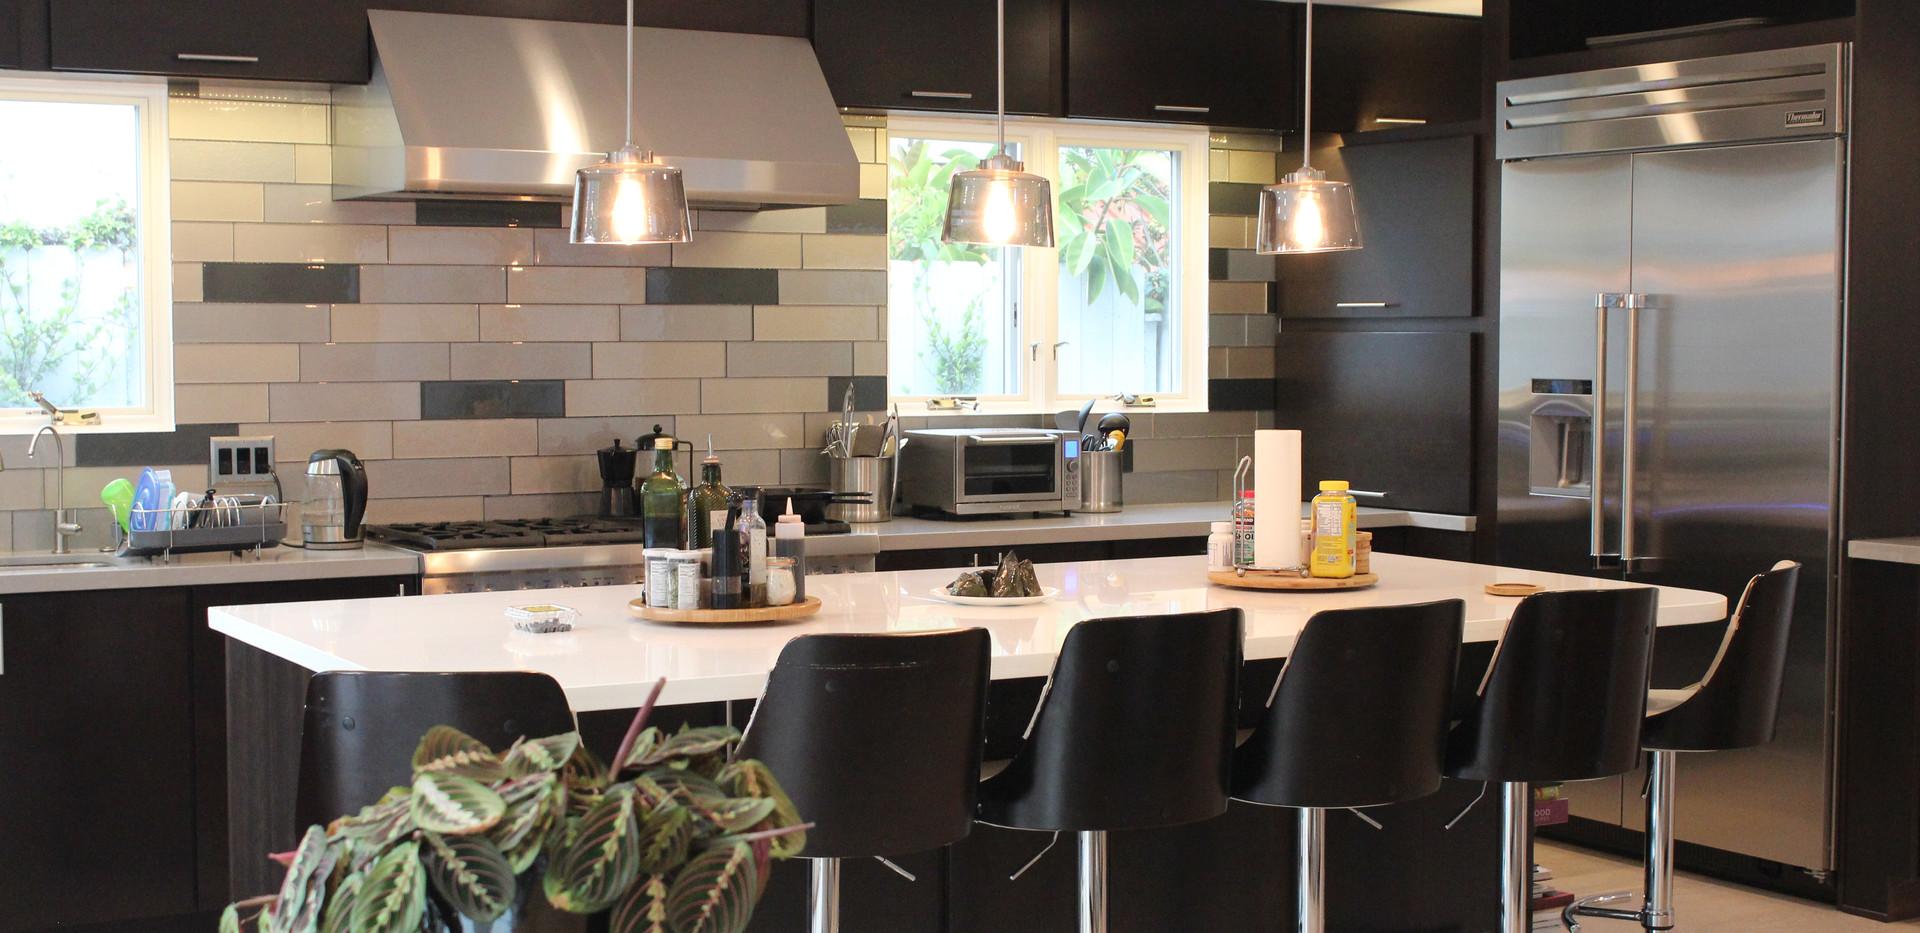 Kitchen_IMG_8728.JPG